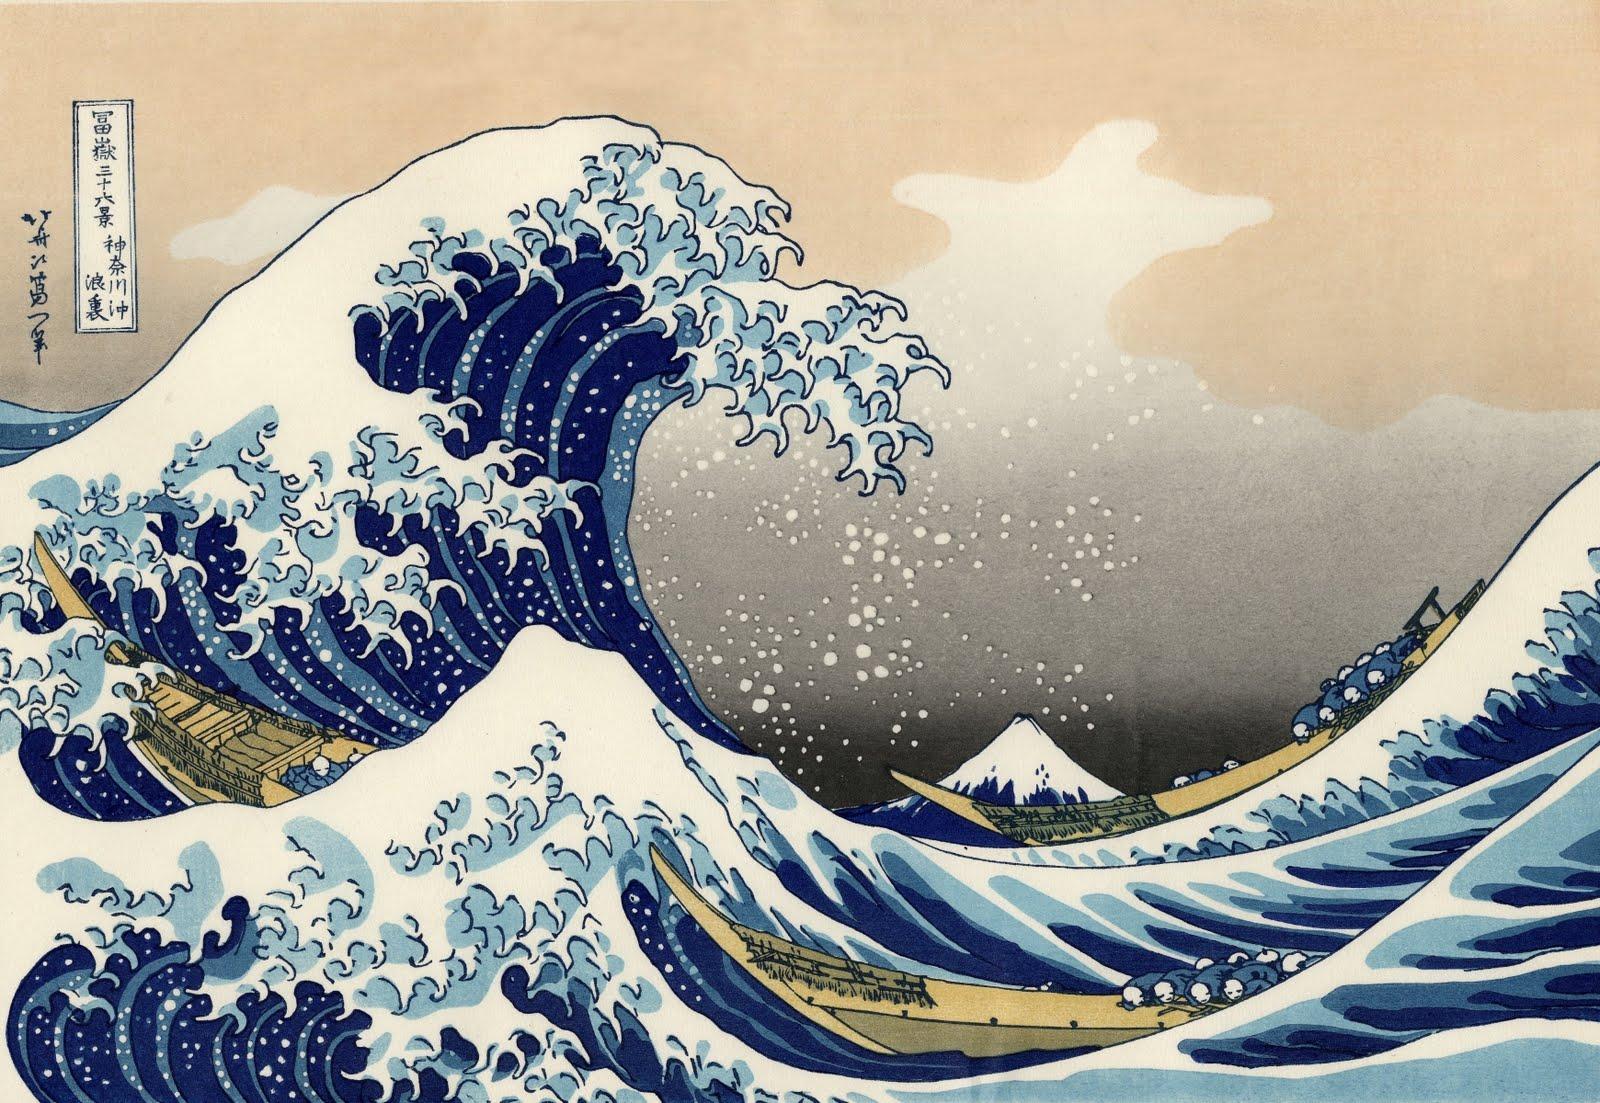 http://1.bp.blogspot.com/_TM0Qm0a6wgE/S6wWRVHd0DI/AAAAAAAACno/1H8_3VWKyHg/s1600/Konachan.com+-+71730+oboro_muramasa.jpg